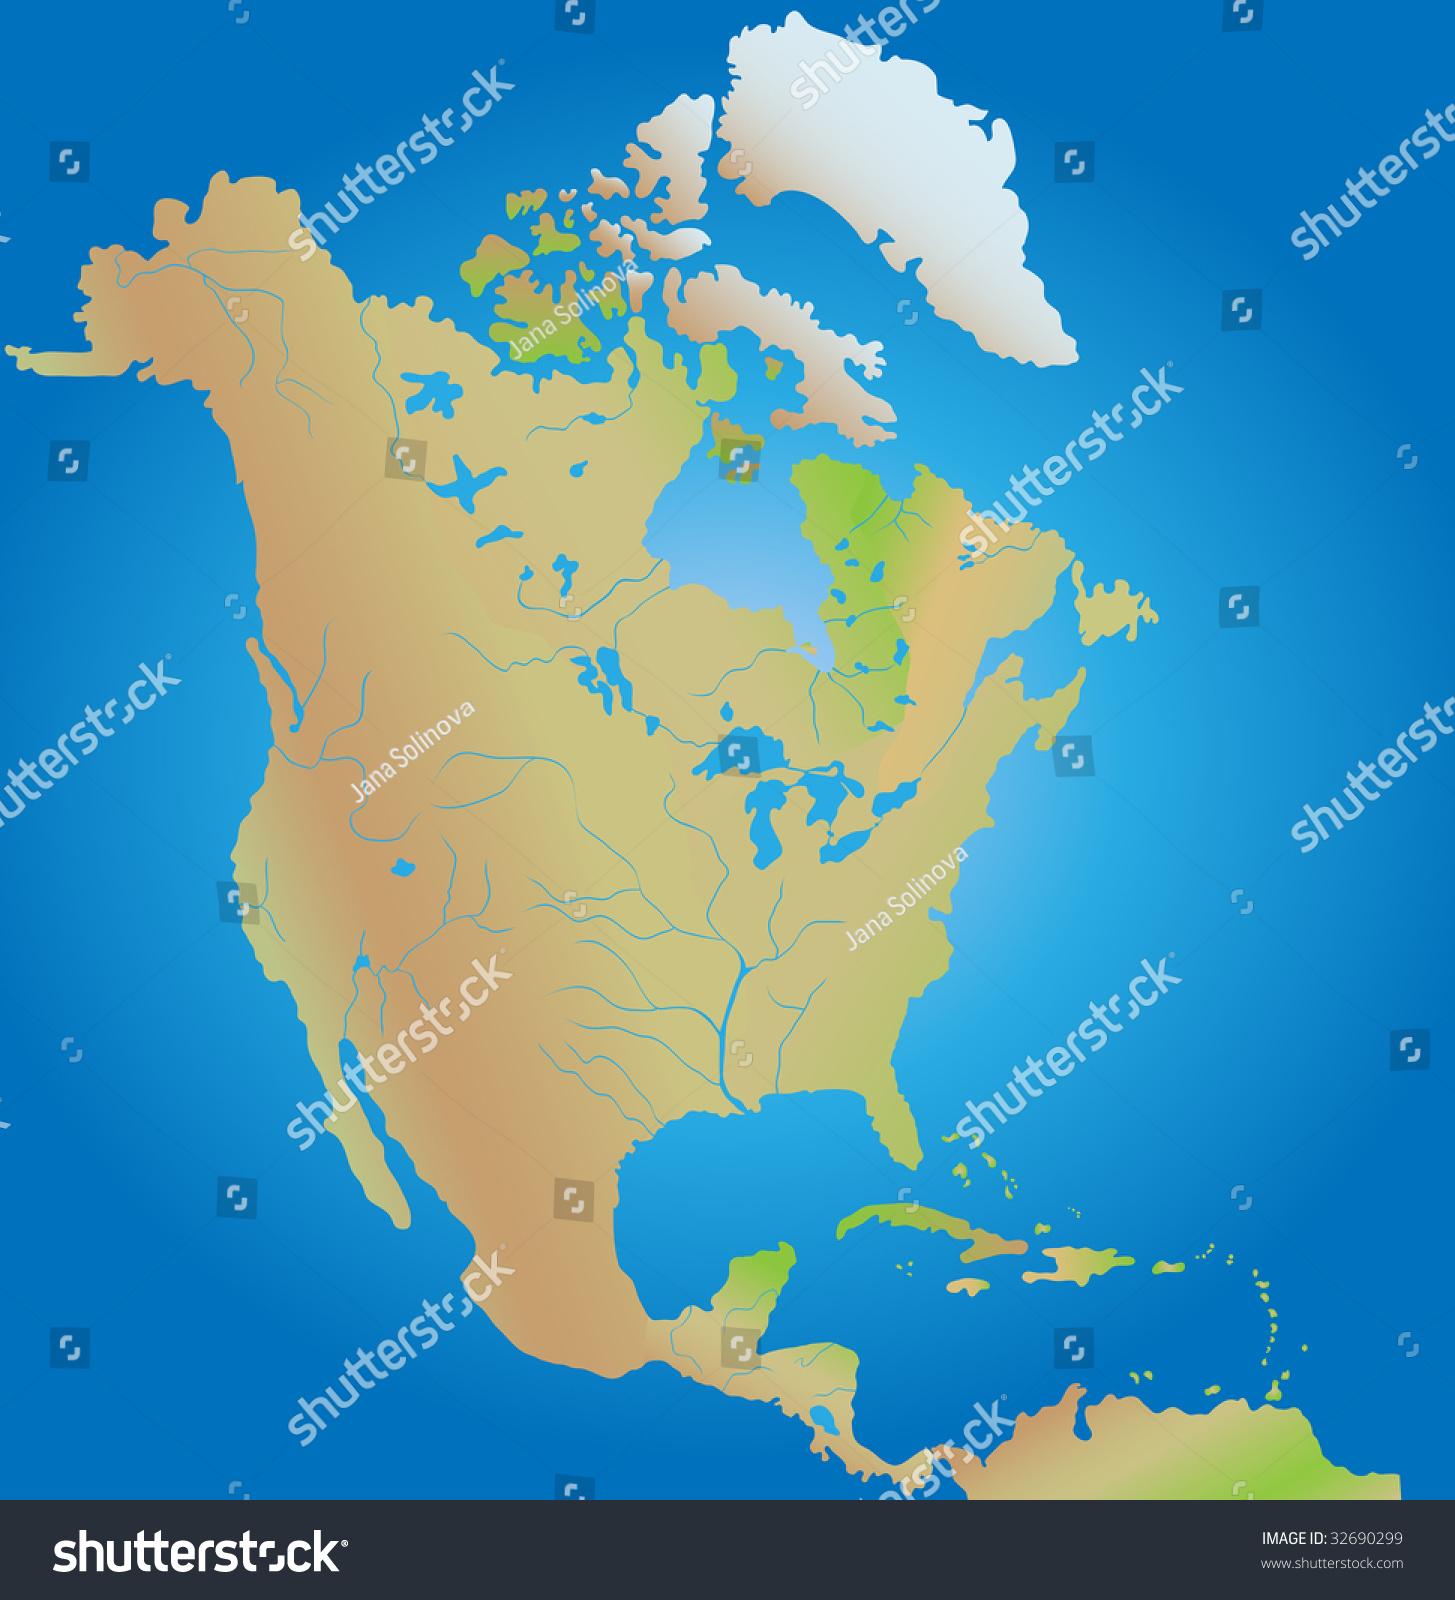 US Doppler Radar Weathercom NWS National Mosaic Enhanced Radar - Weather map of us